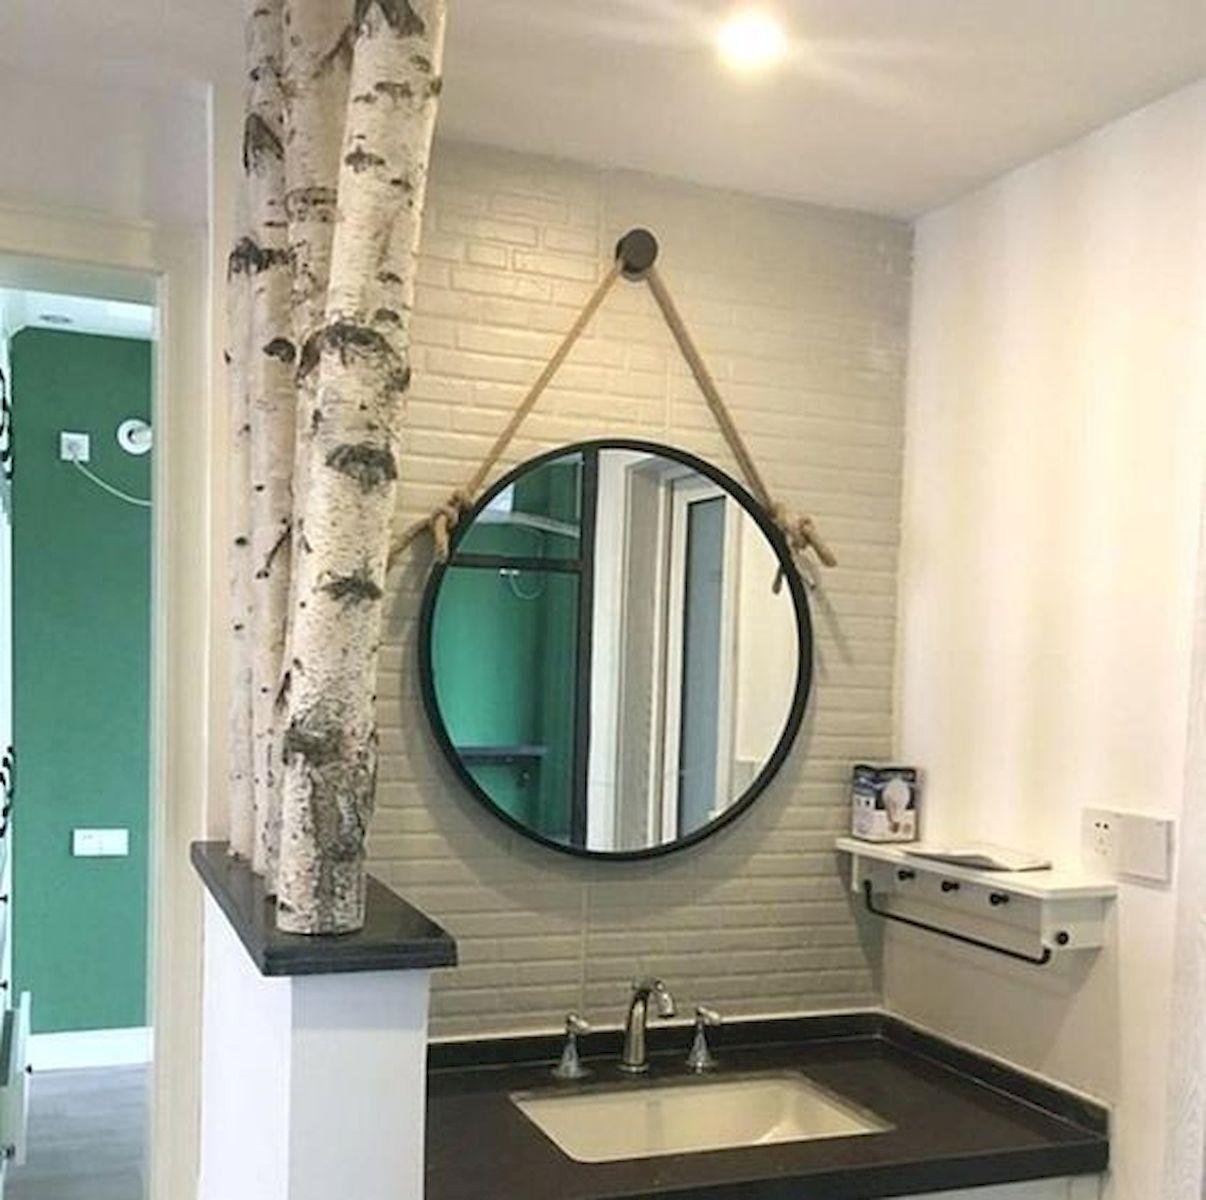 26 Easy and Creative DIY Mirror Ideas To Decorate Your Bathroom (22)